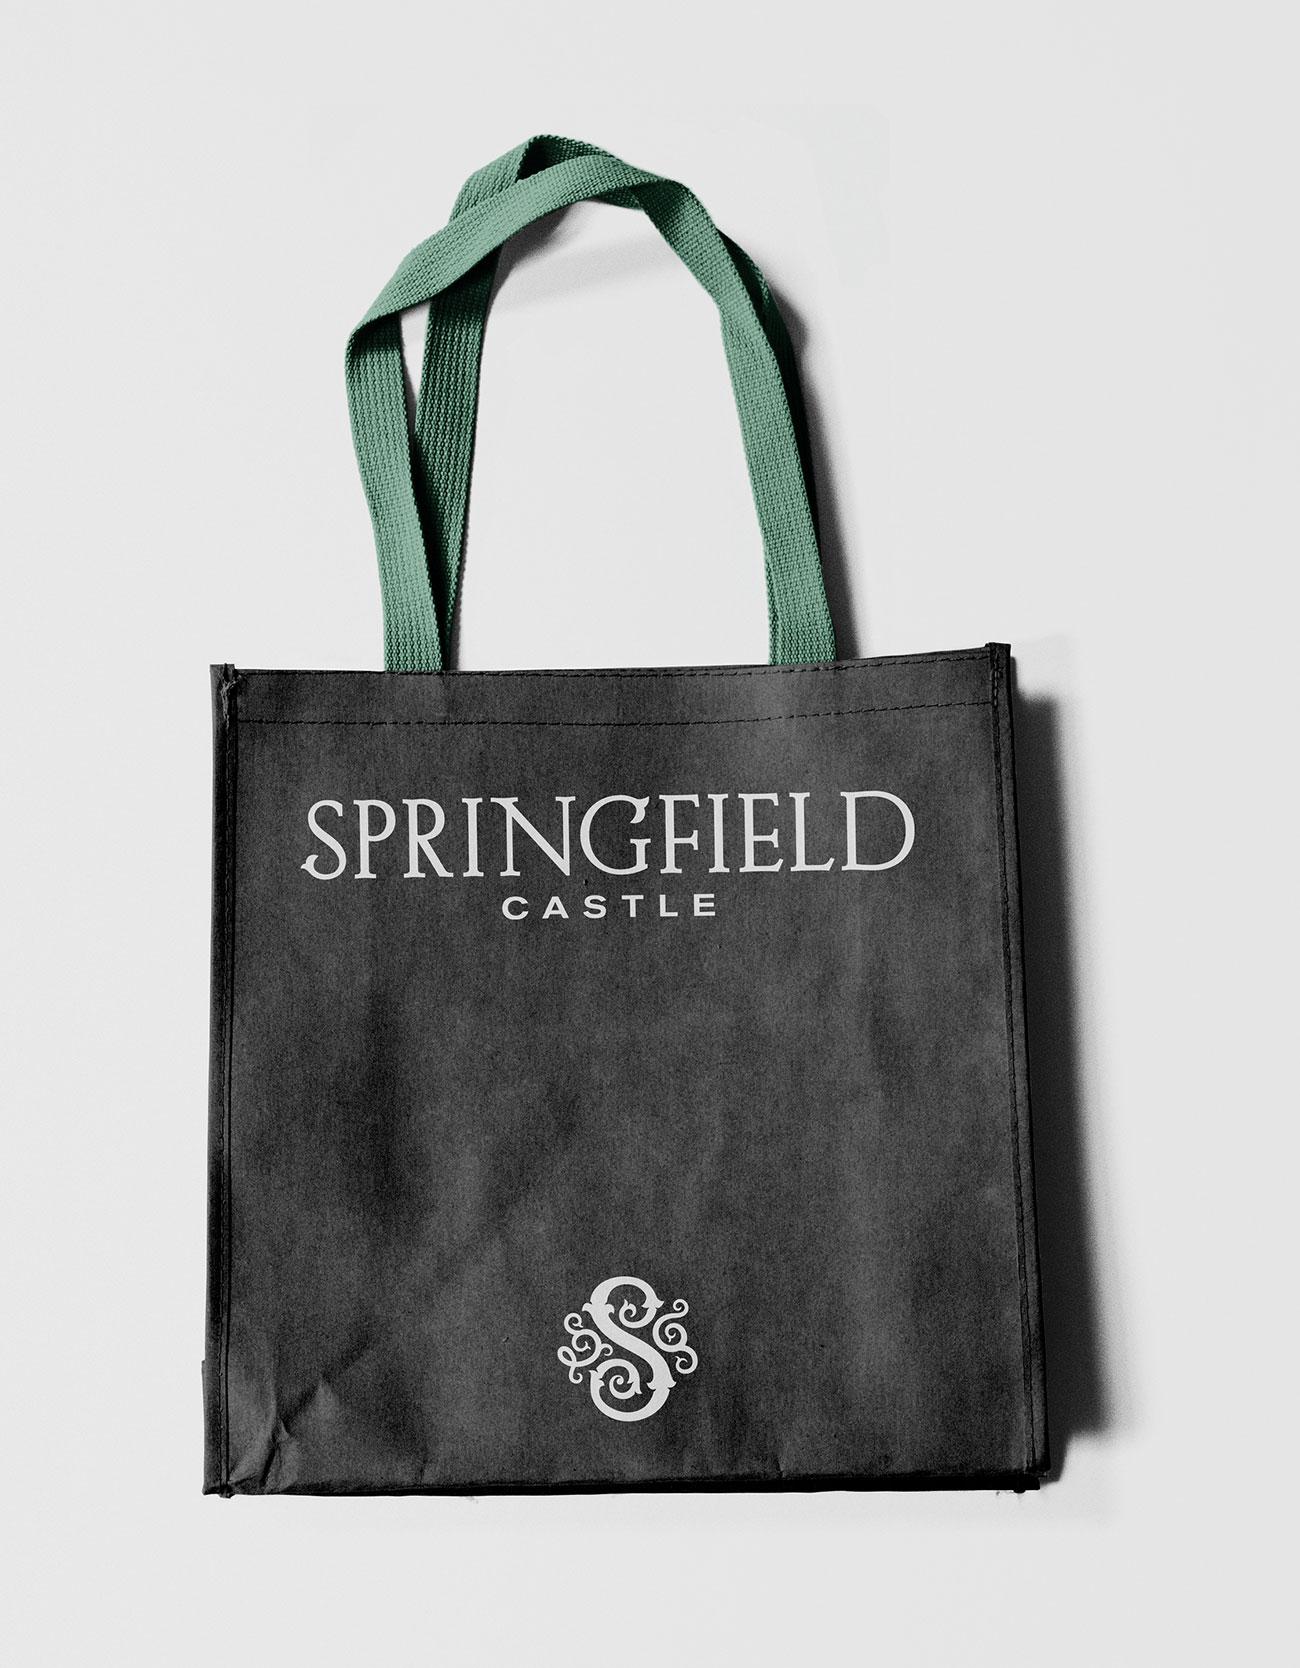 Springfield Castle Brand Application